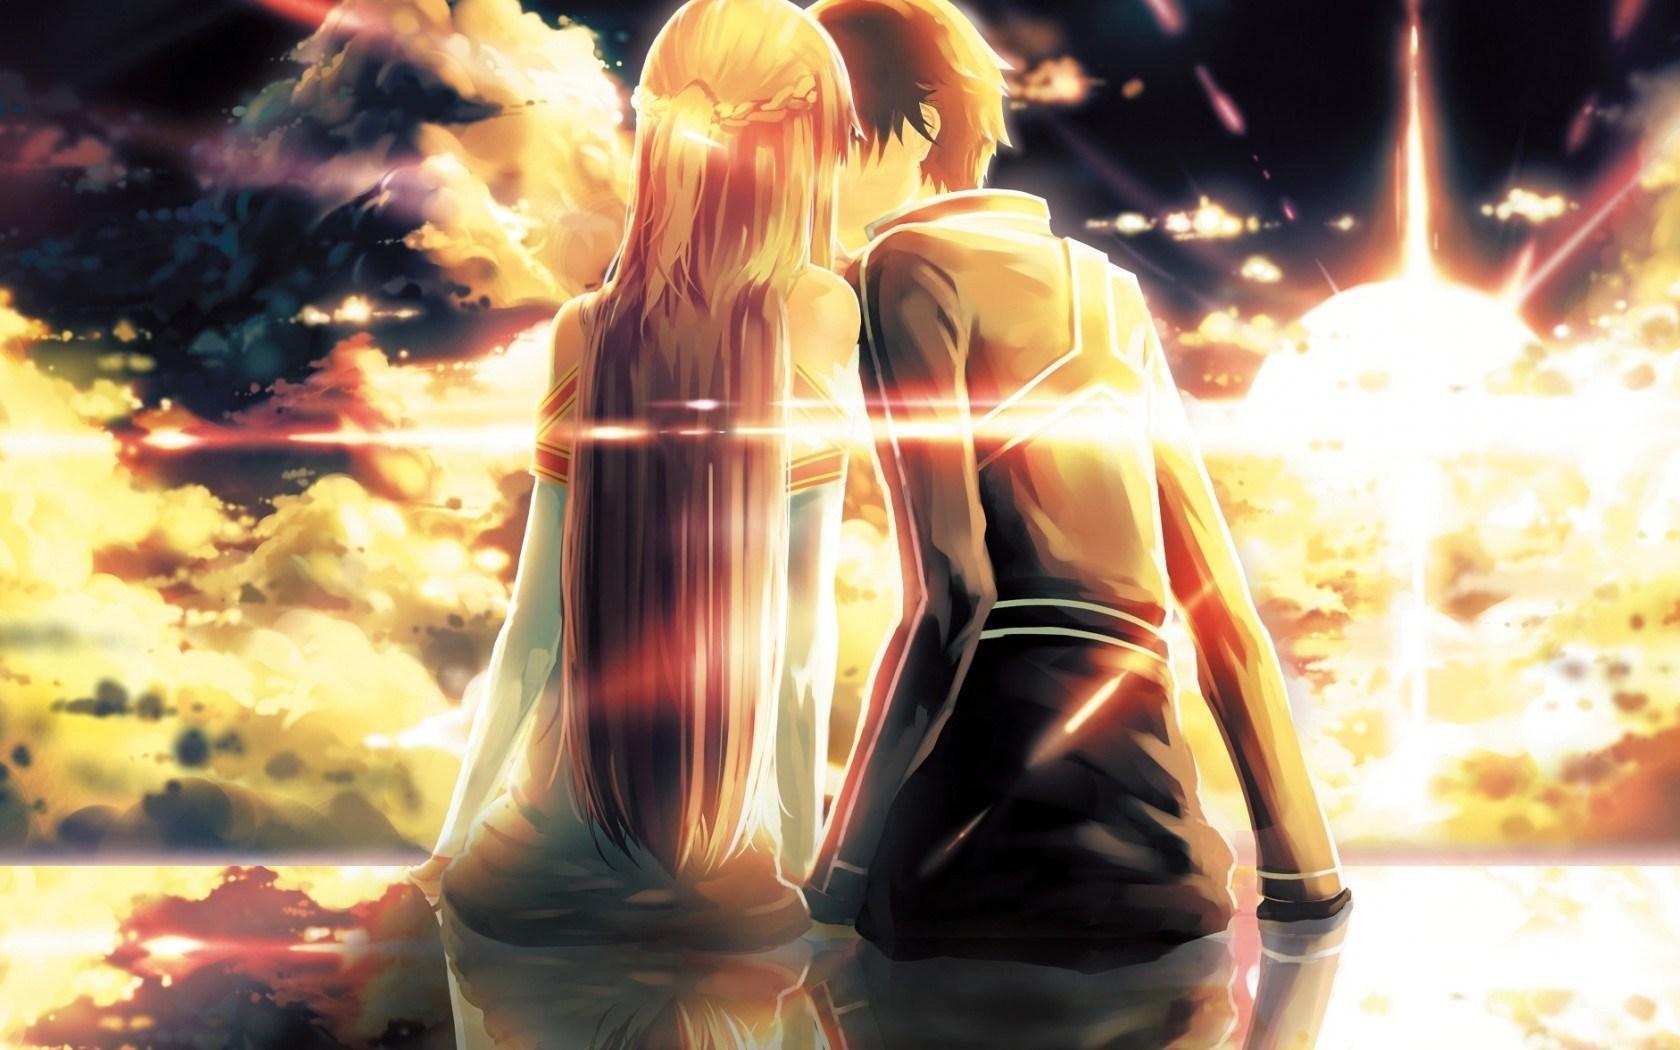 Art Kiss Boy Girl Anime